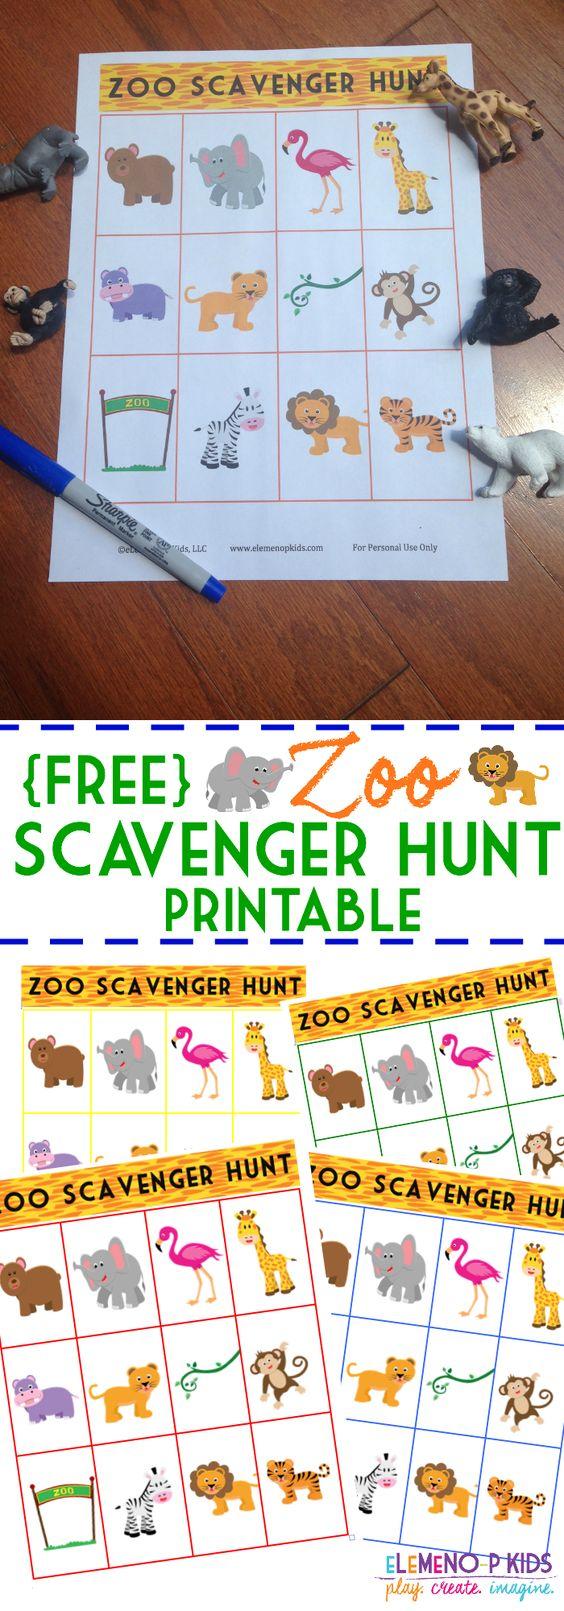 FREE Zoo Scavenger Hunt Printable!